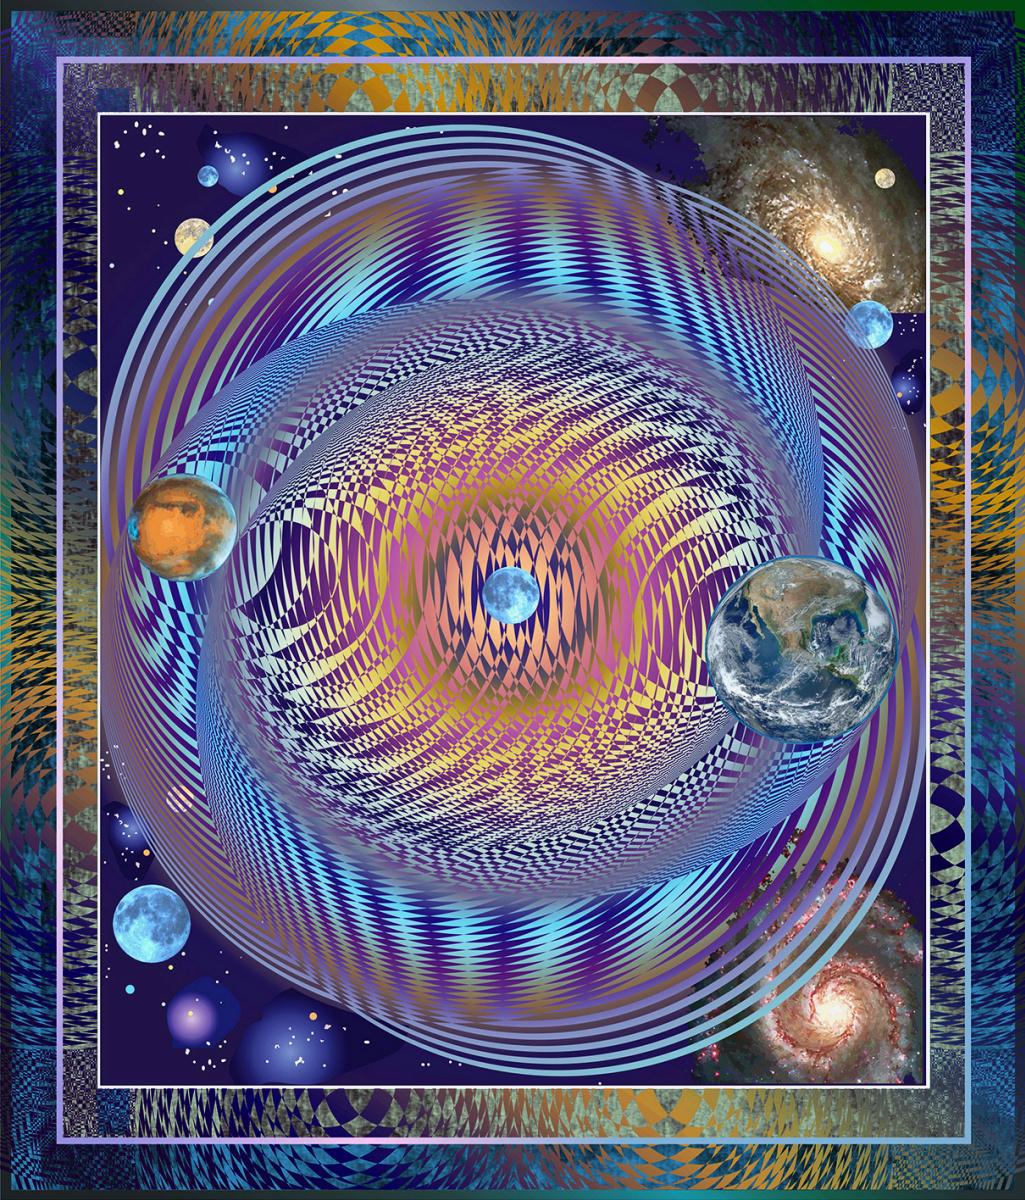 Юрий Николаевич Сафонов (Yury Safonov). Waves of gravitational interference